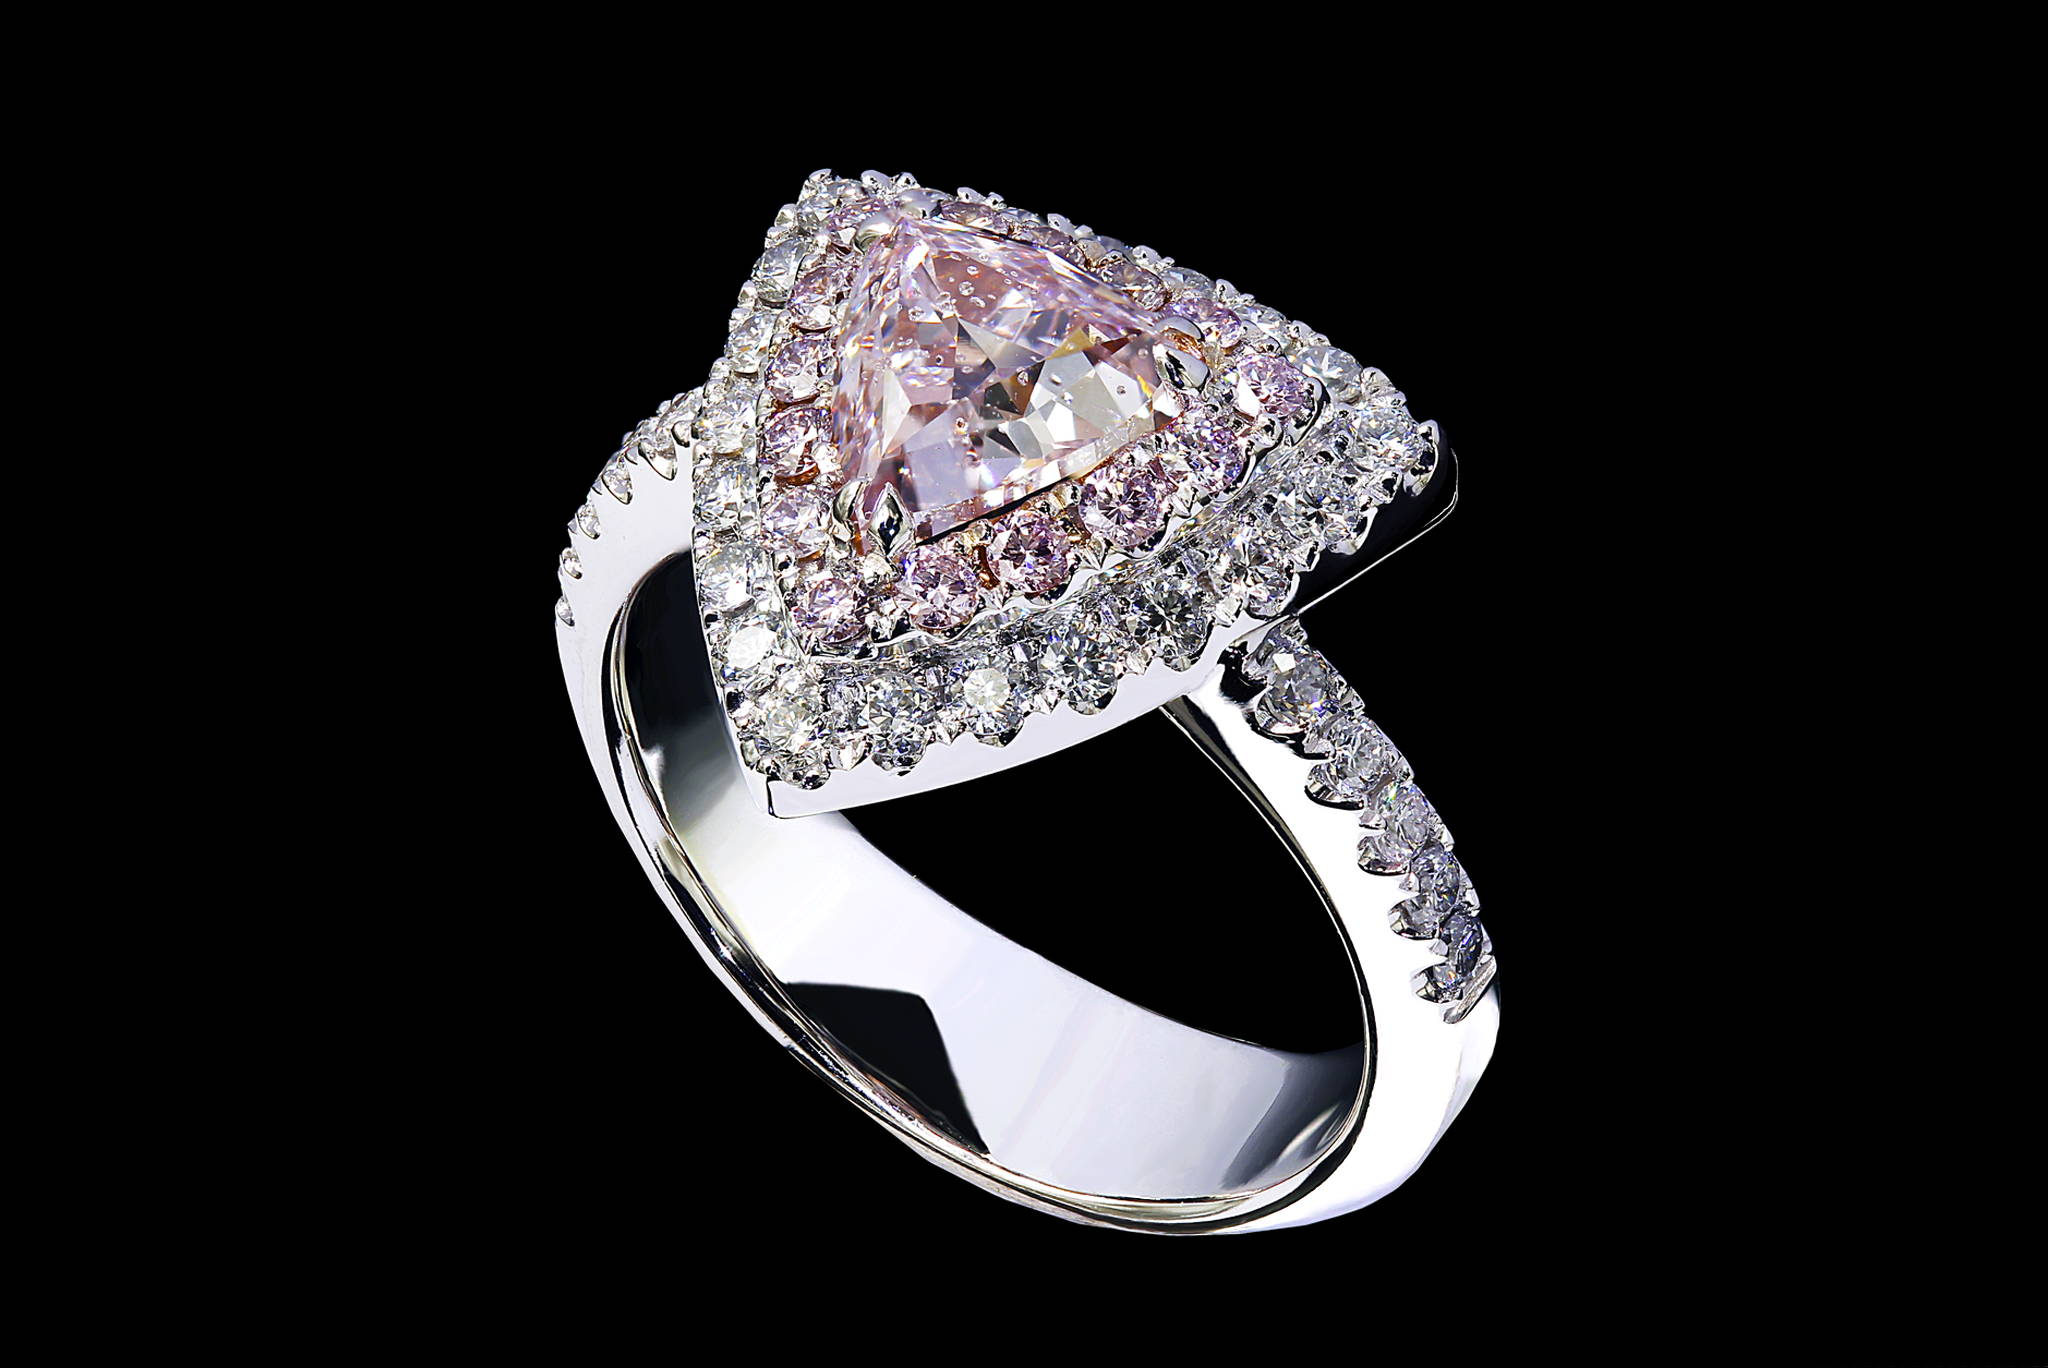 Rare Trilliant Cut Intense Pink Diamond Ring 45 degrees view